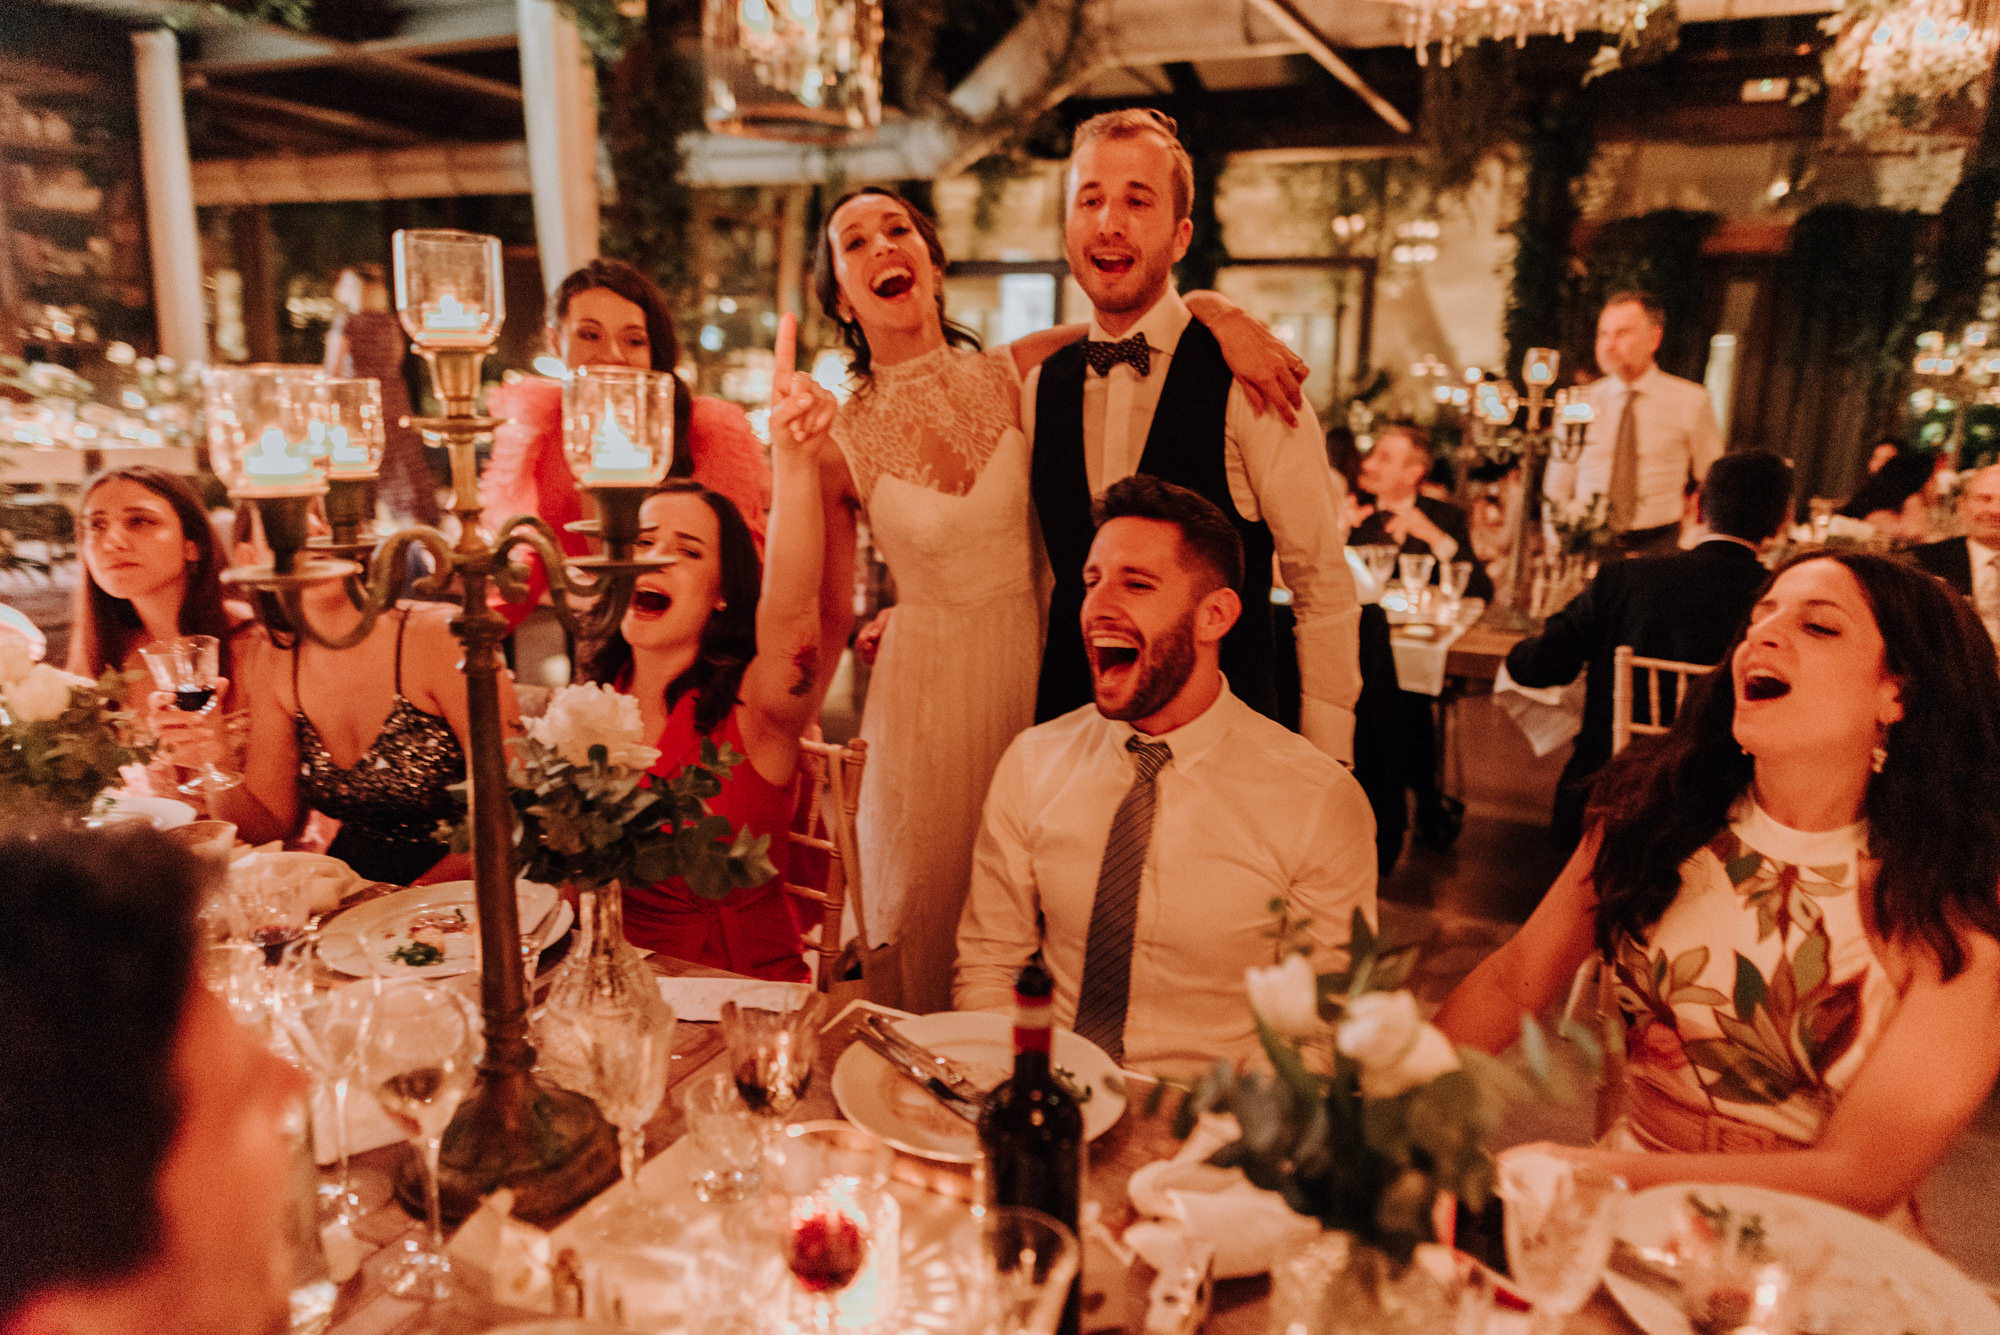 FOTO+PHOTO+BODA+WEDDING+ITALIA+ITALY+MAURICIO+GARAY+MAURICIOGARAY+WEDDINPHOTOGRAPHER+FOTOGRAFODEBODA-1792.jpg